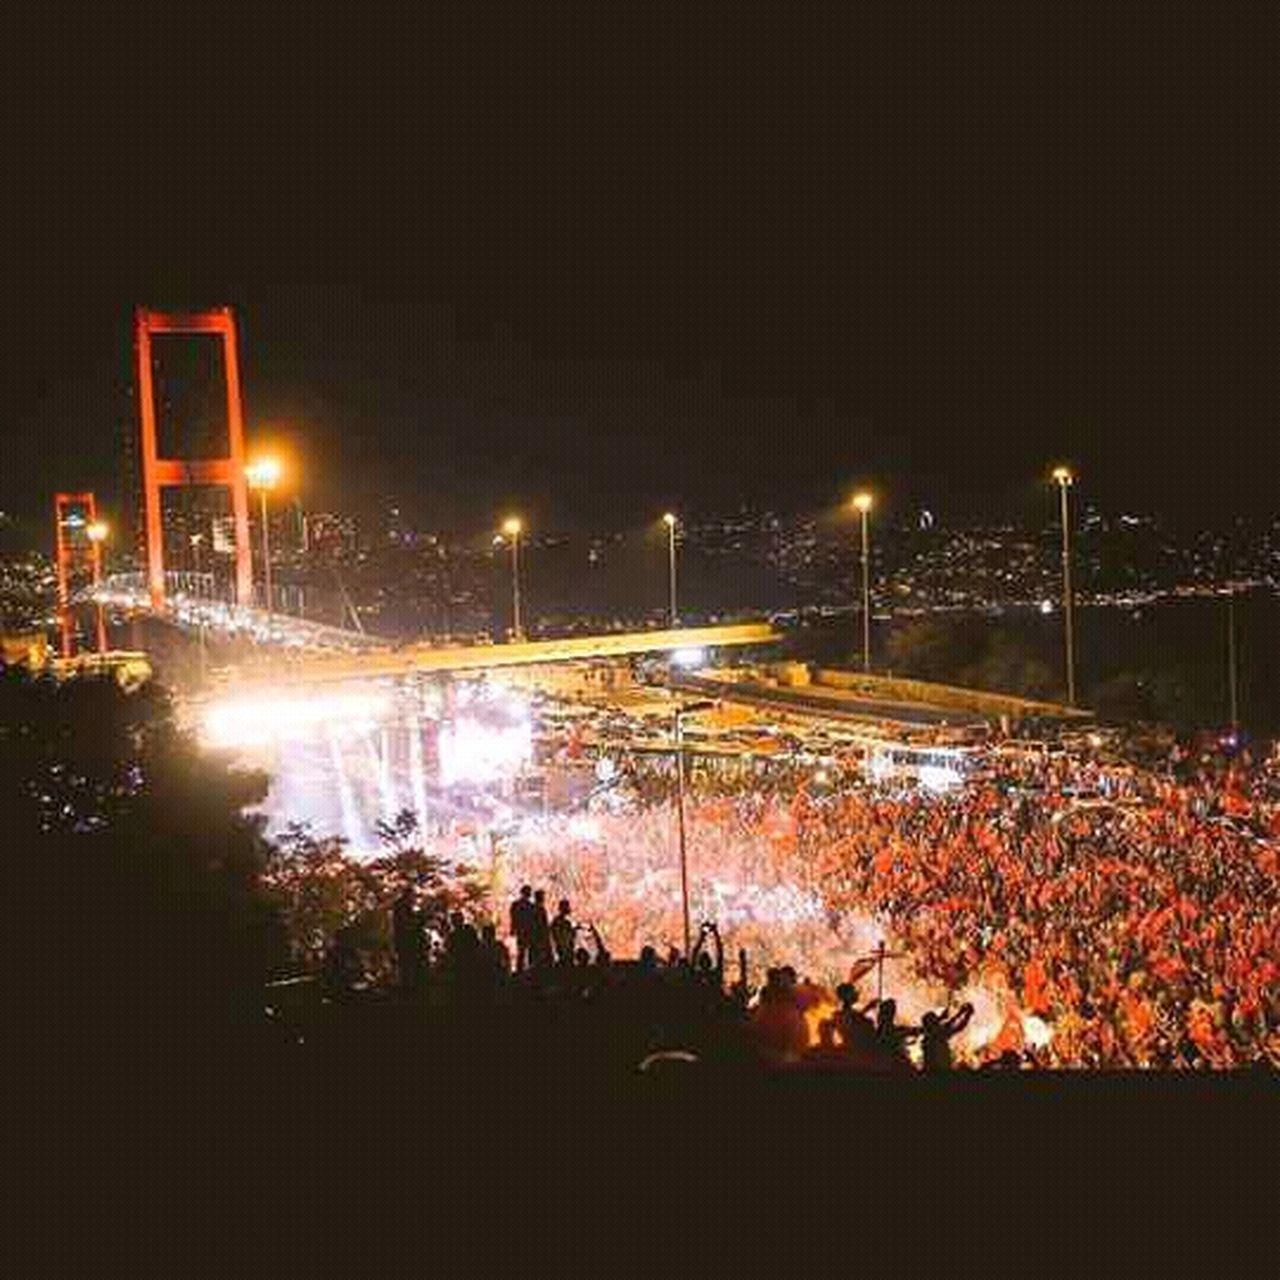 night, illuminated, street light, crowd, event, outdoors, large group of people, nightlife, city, popular music concert, sky, people